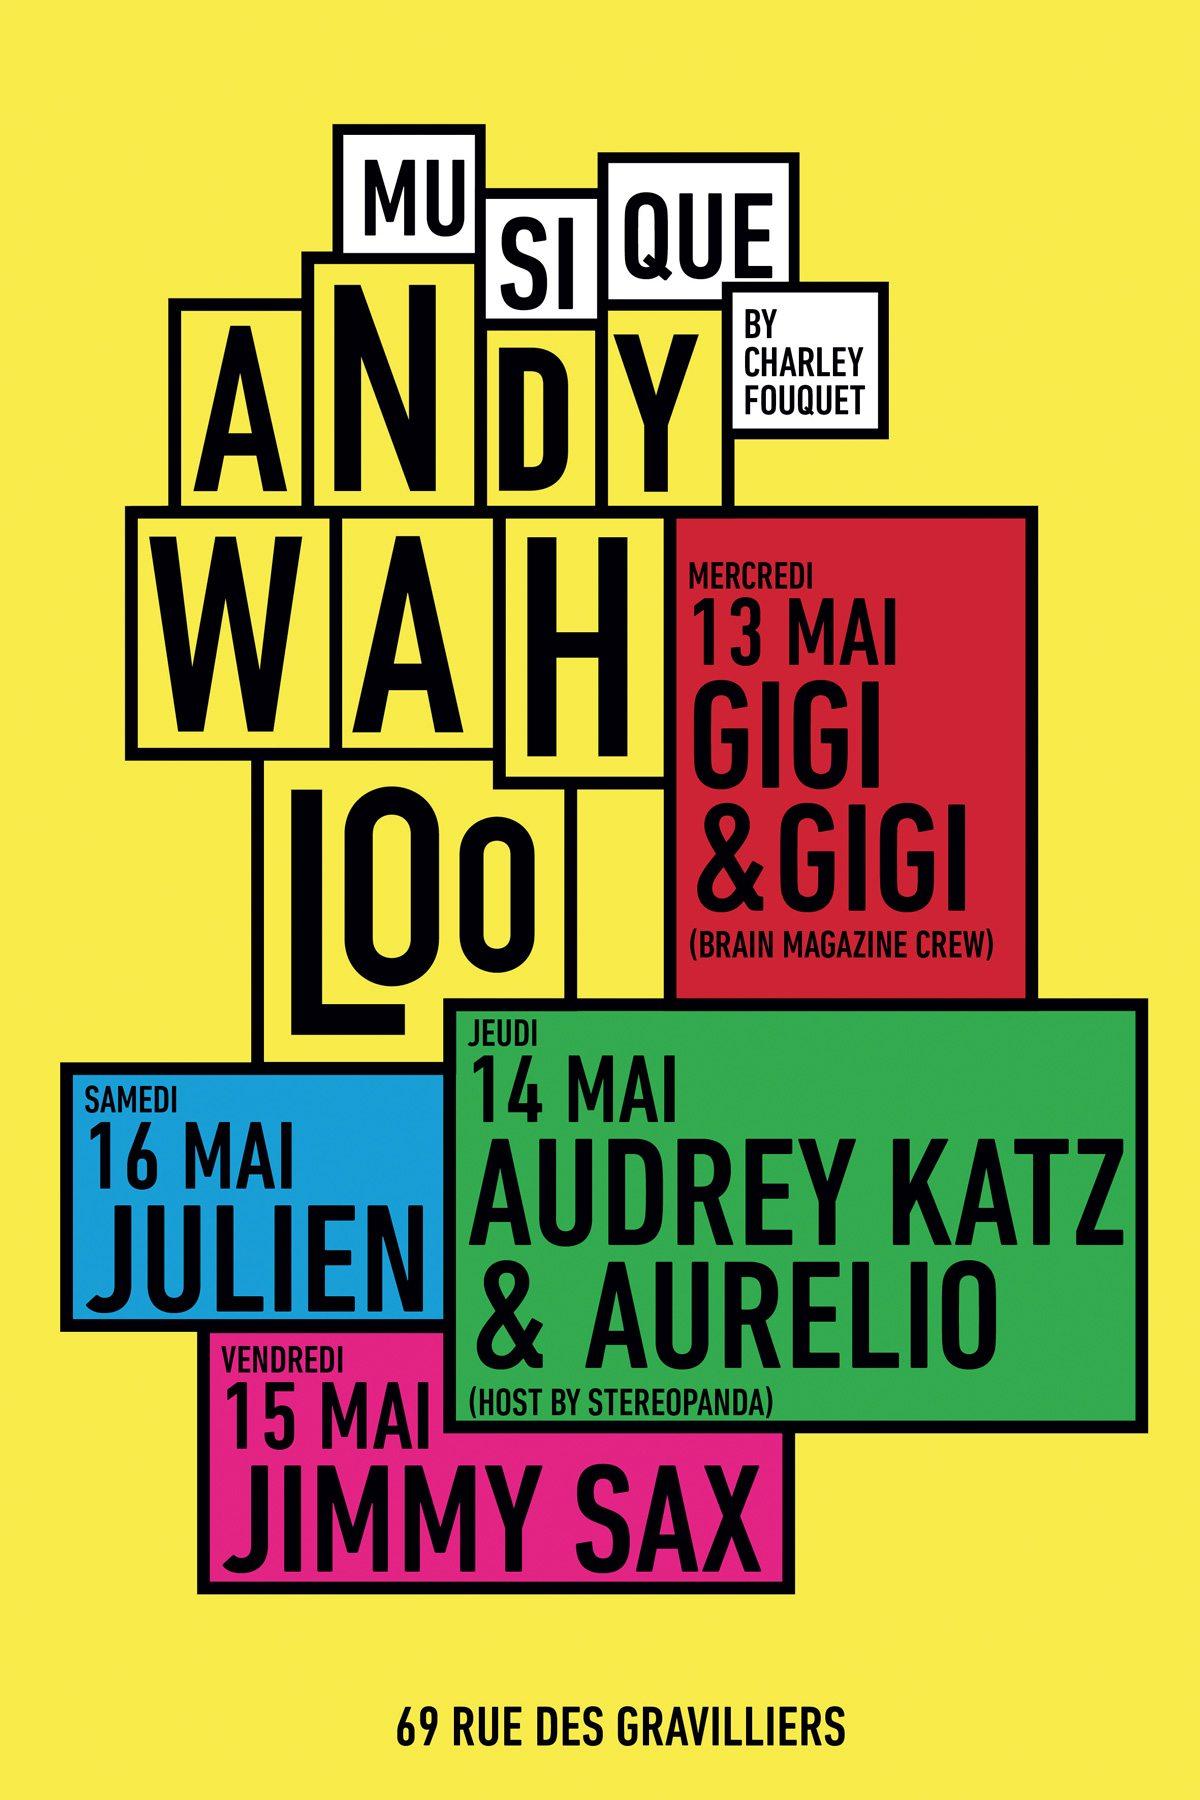 Andy-Wahloo-mailing-jaune_IchetKar